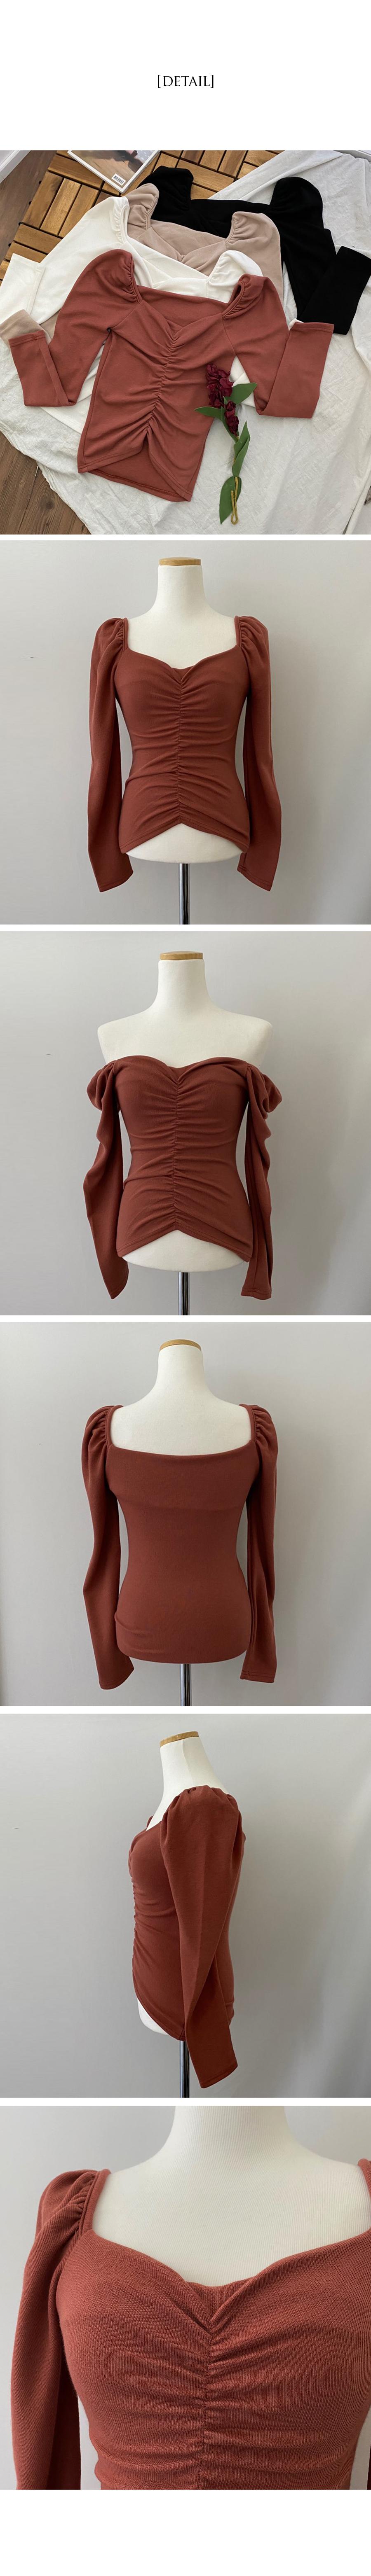 Meringue puff shirred knit T-shirt